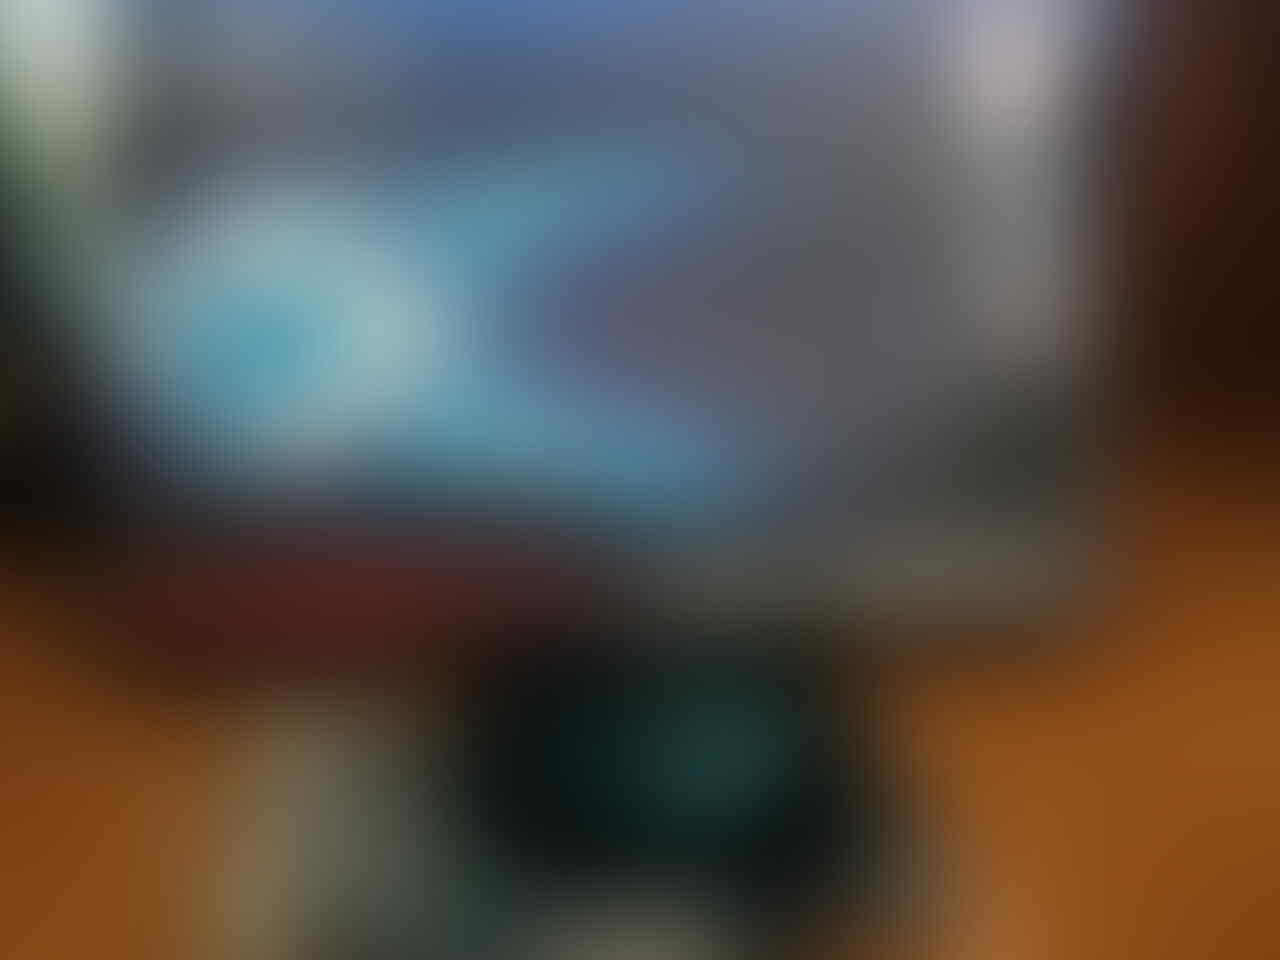 HIS ATI RADEON HD 4850 >>>SOLO